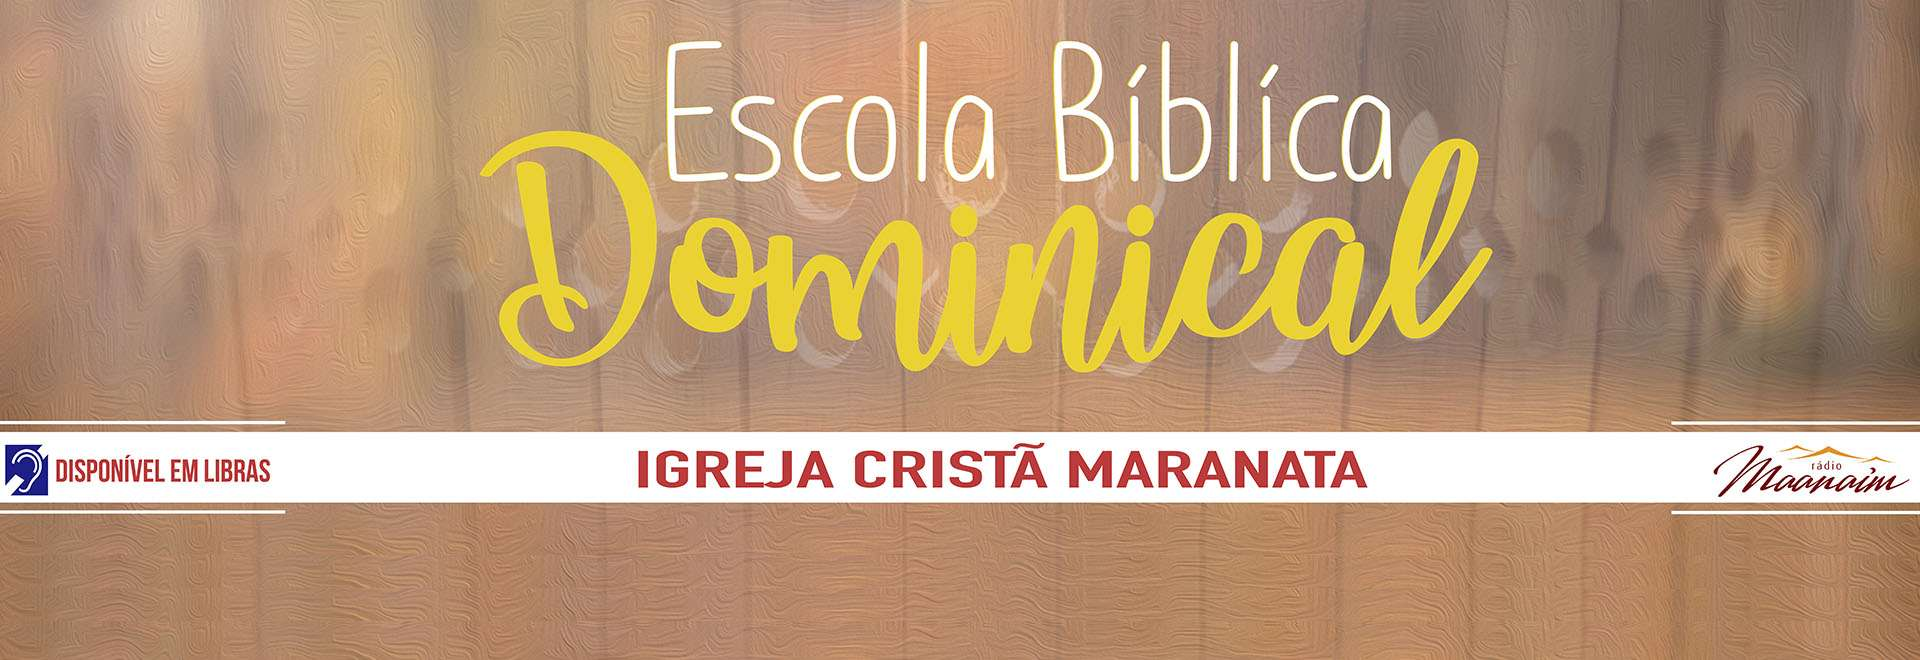 Participações da EBD da Igreja Cristã Maranata - 20/09/2020